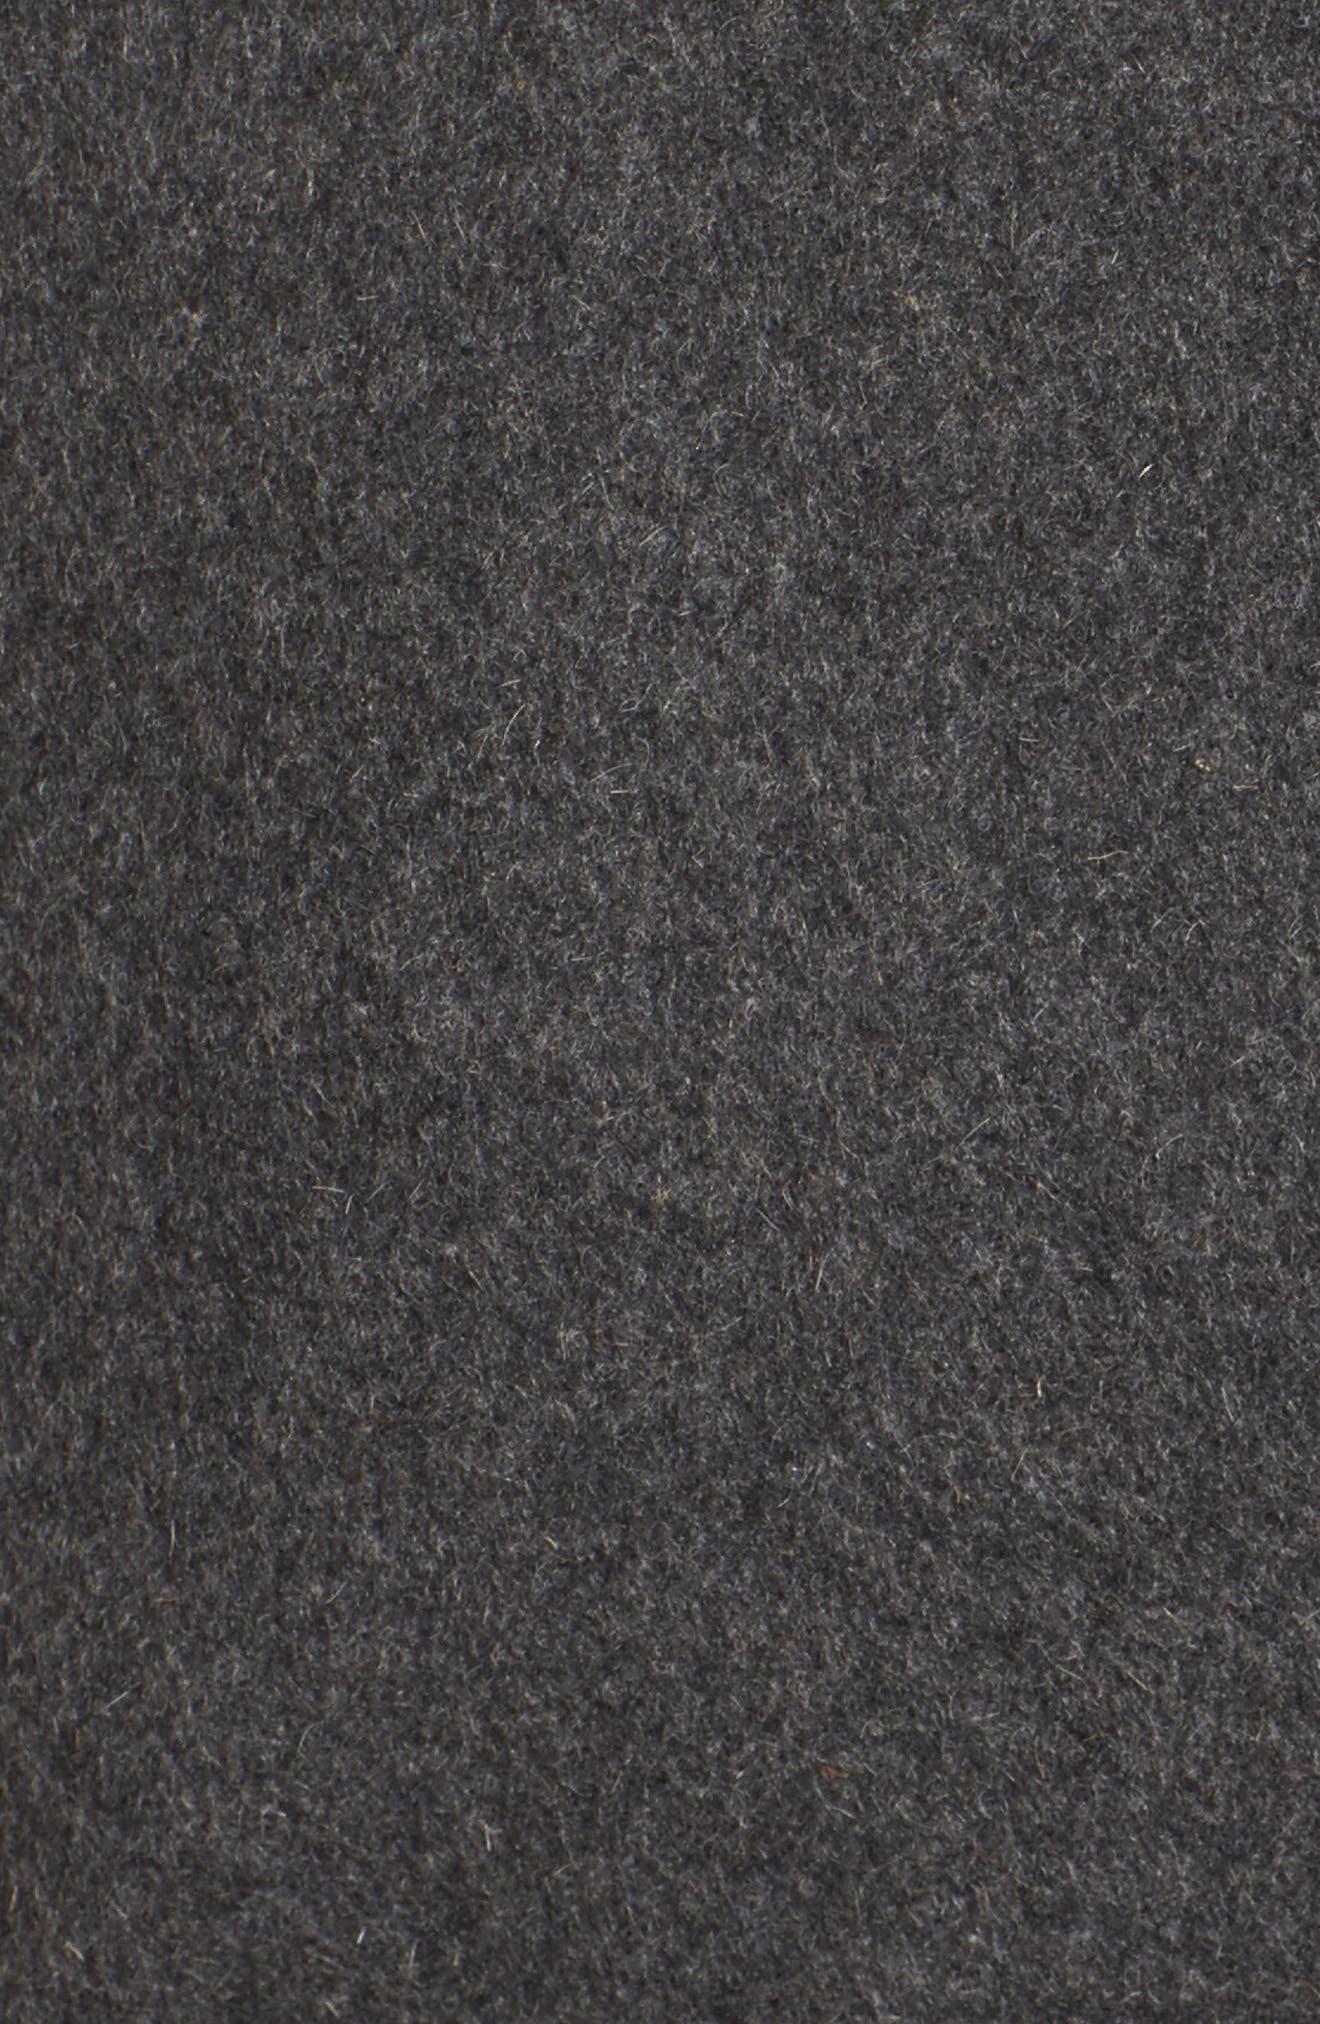 Brooklyn Colorblock Coat,                             Alternate thumbnail 5, color,                             Grey/ Black